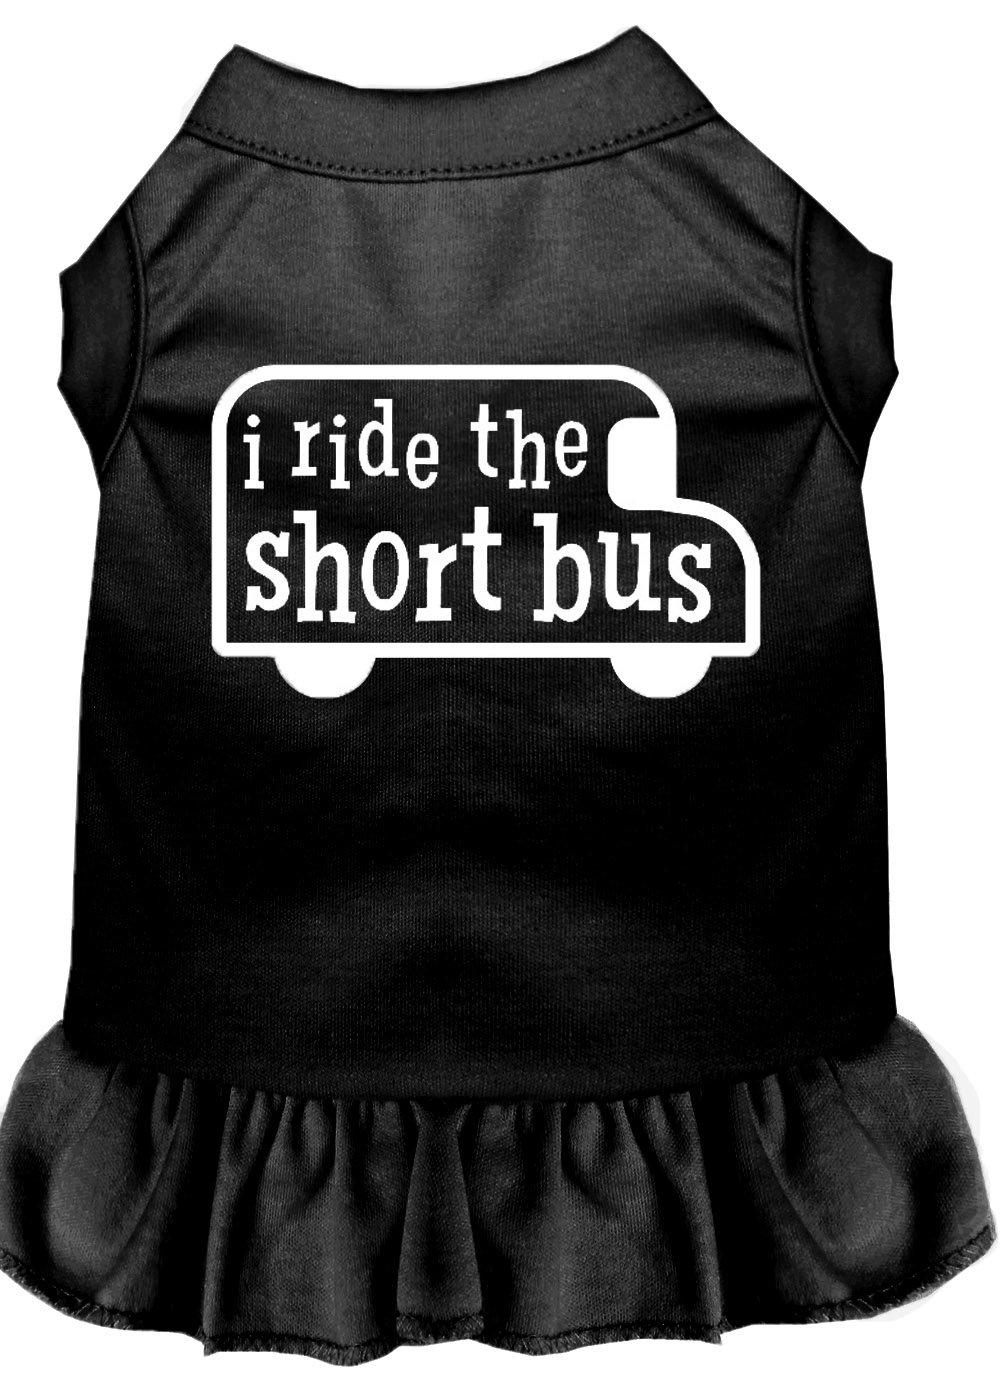 Mirage Pet Products 57-48 XXXLBK Black I Ride The Short Bus Screen Print Dress, 3X-Large